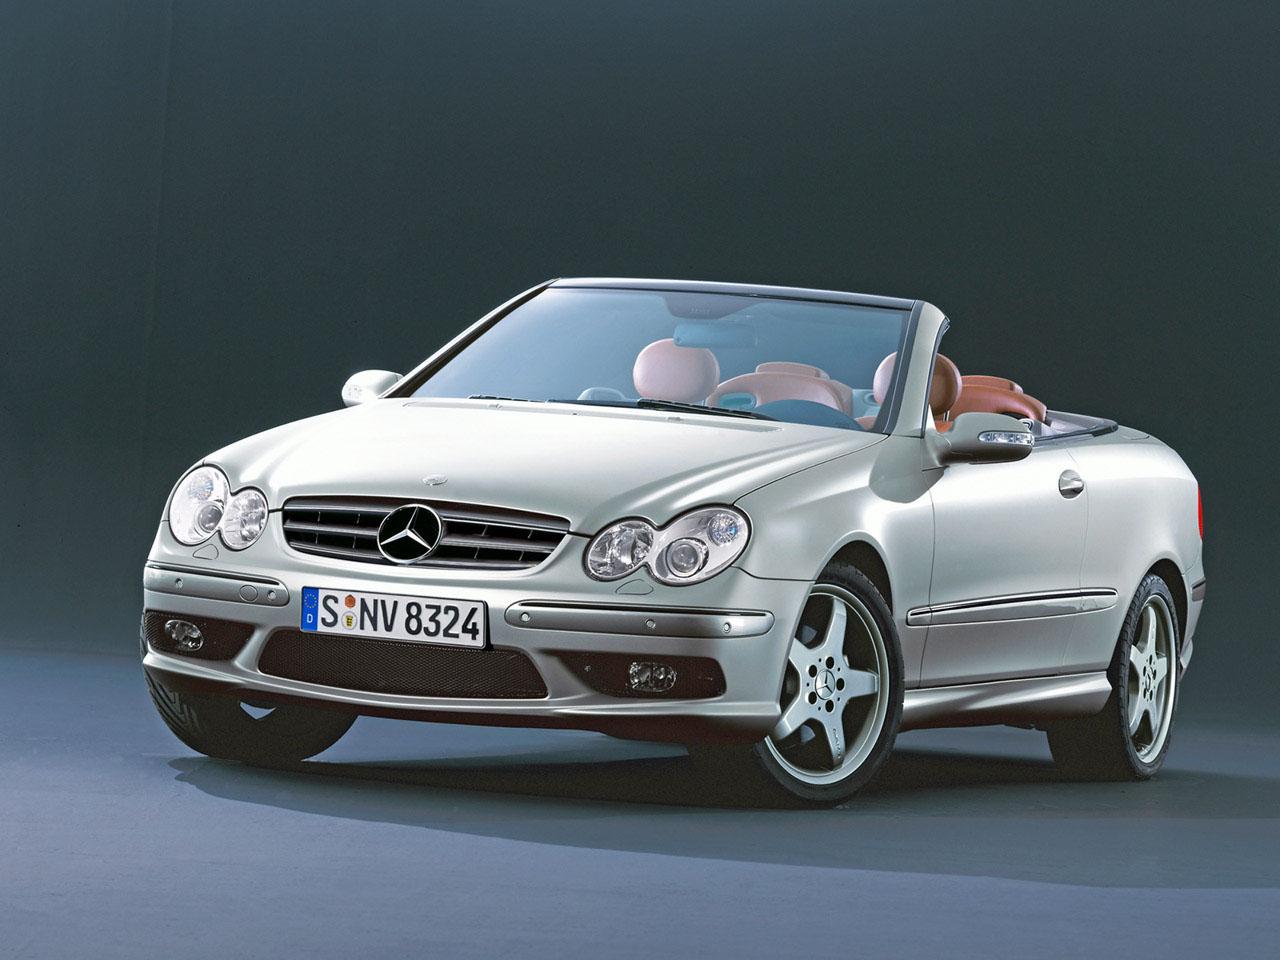 racing cigalo mercedes benz clk 500 cabrio 2005. Black Bedroom Furniture Sets. Home Design Ideas